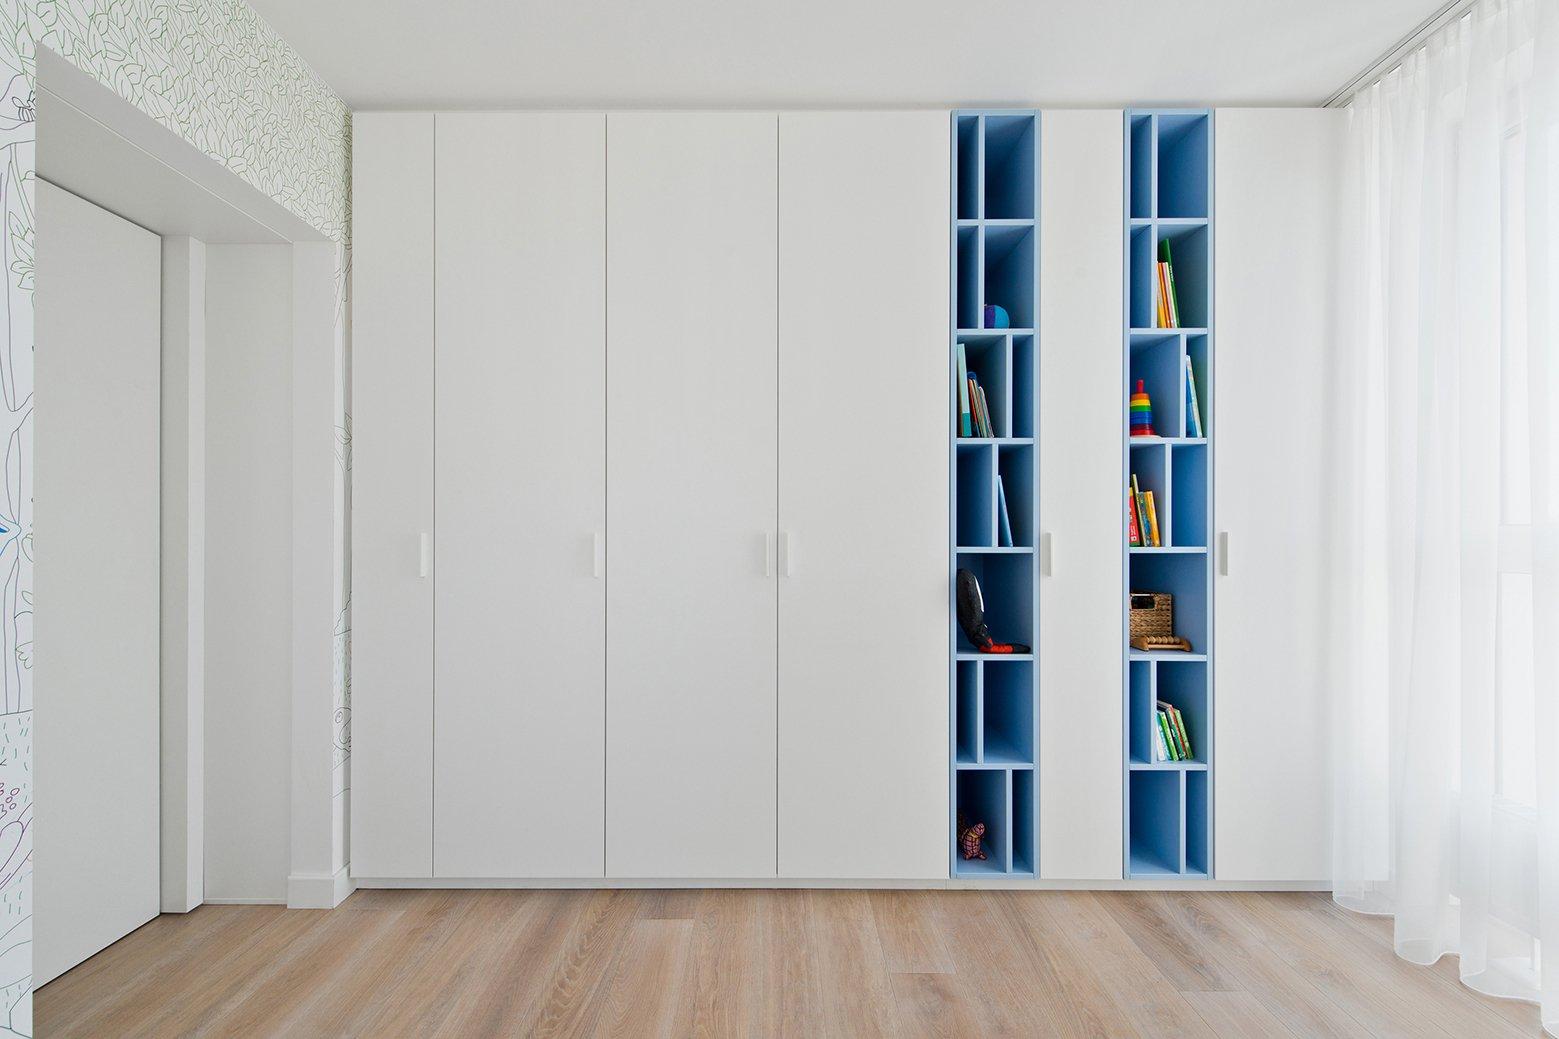 Apartment-in-Vilnius-Normundas-Vilkas-Lithuania-Storage-Humble-Homes